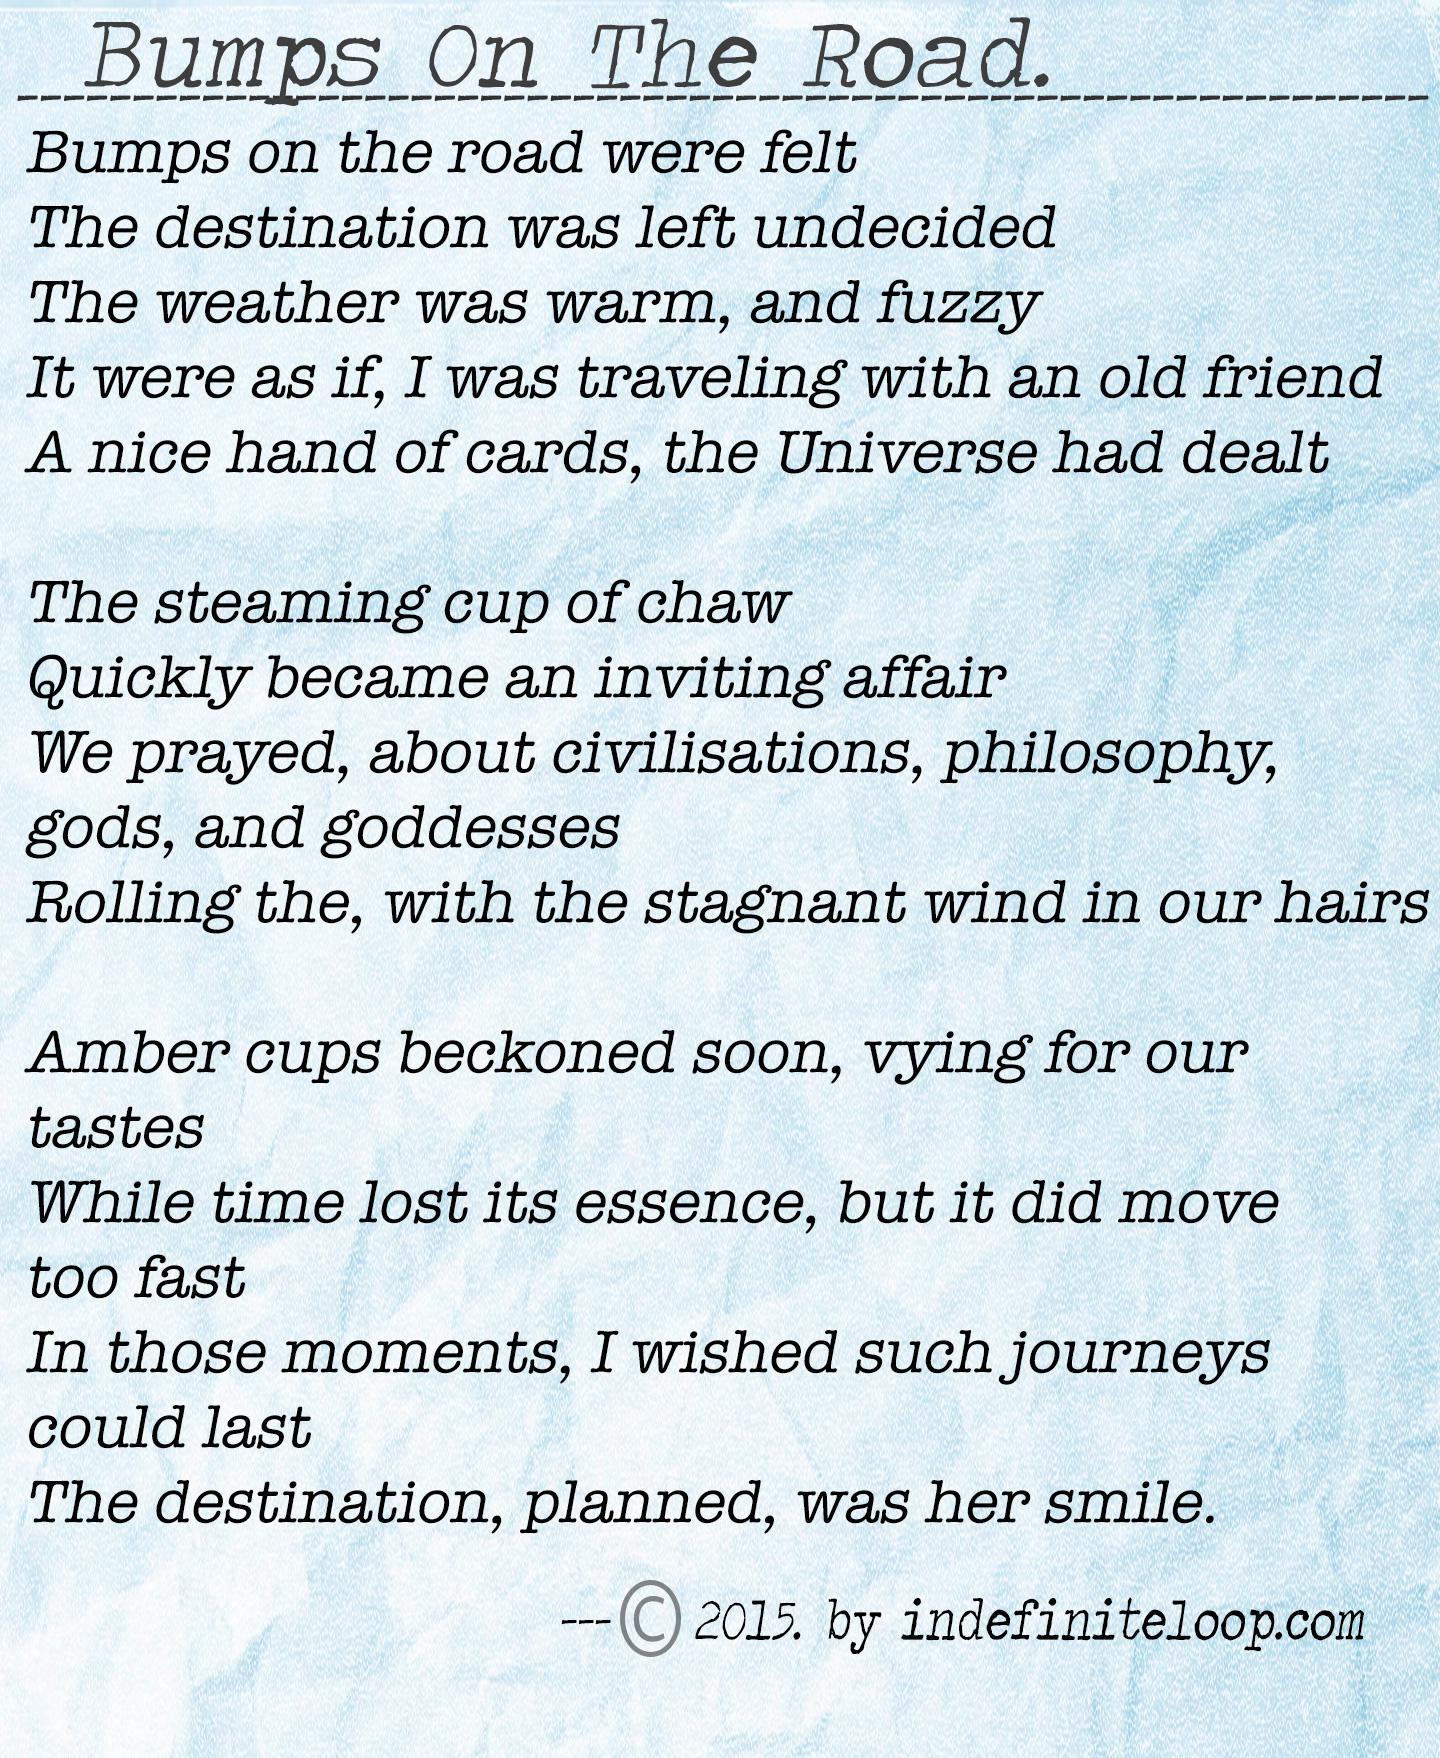 Bumps On The Road - Poem - Copyright indefiniteloop.com